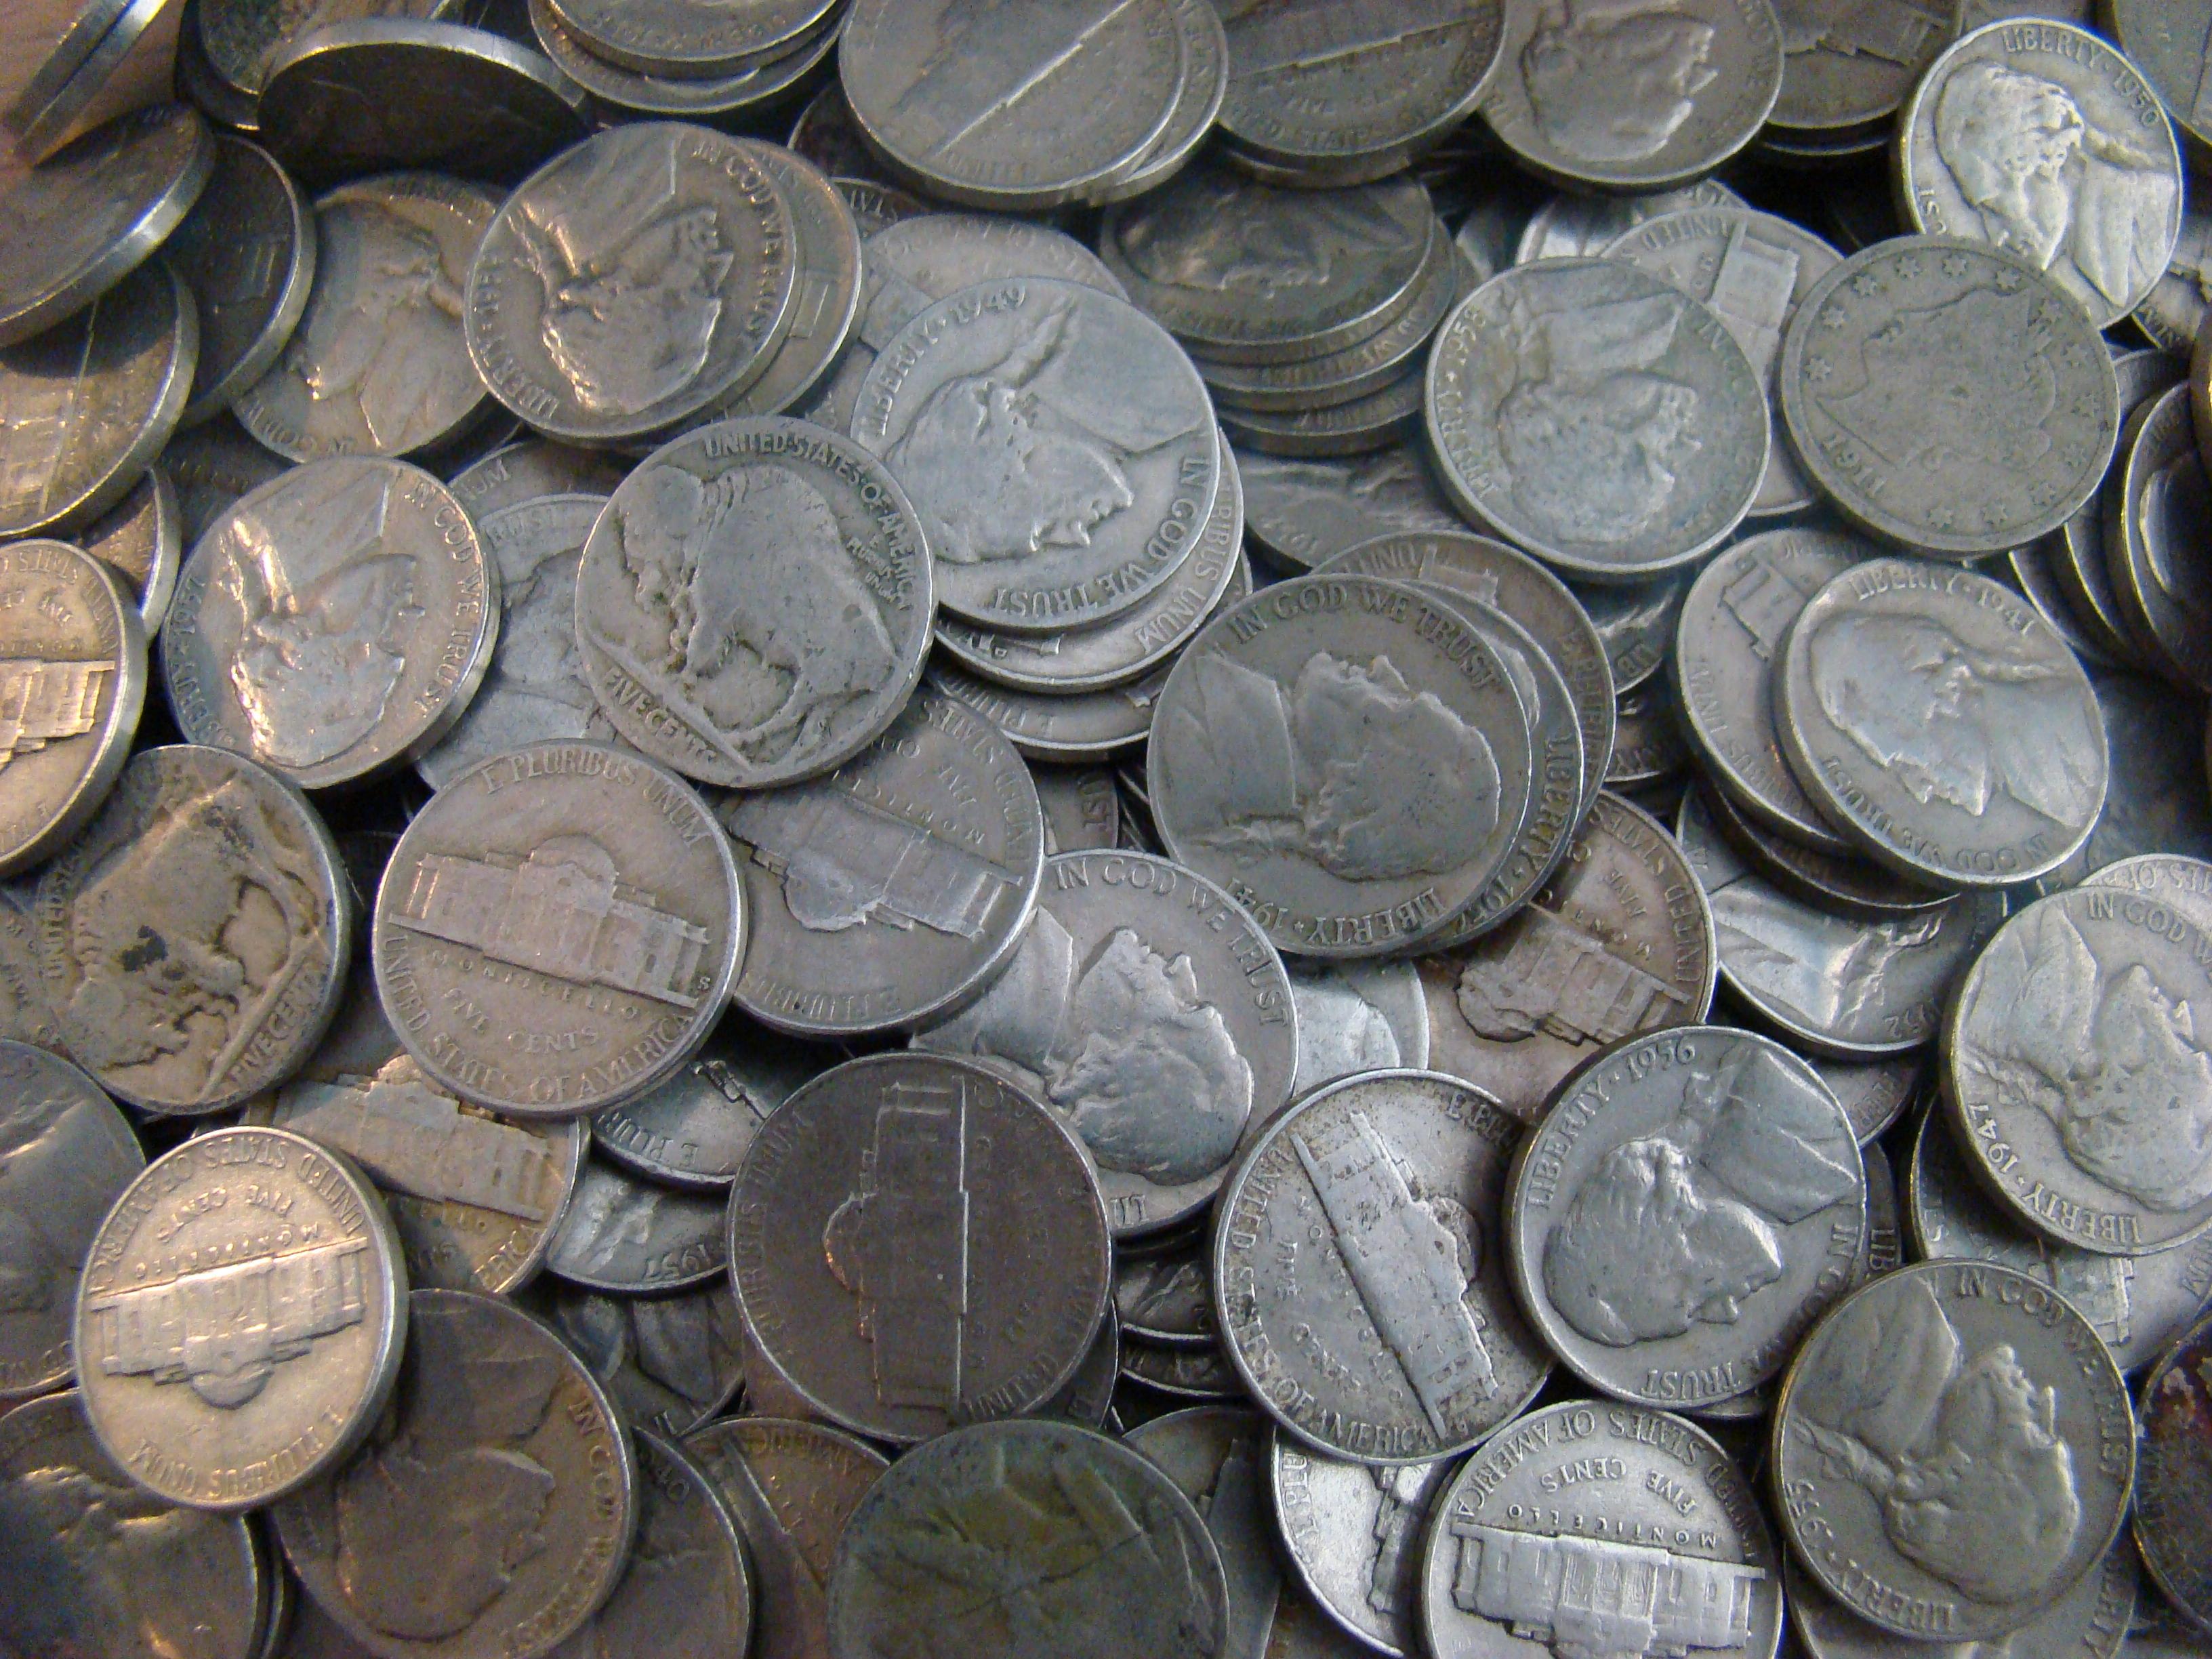 2 top nickel stocks to buy in 2017